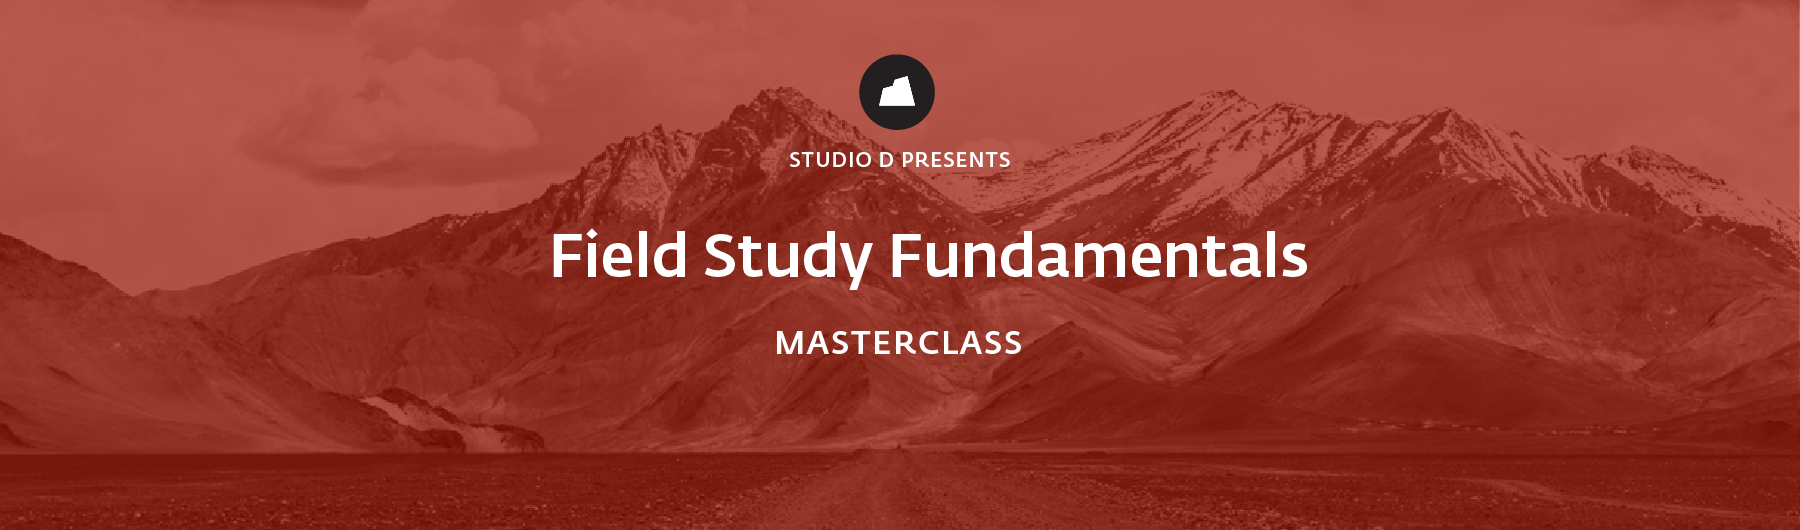 Field Study Fundamentals Masterclass, 16 April 2020, Bengaluru